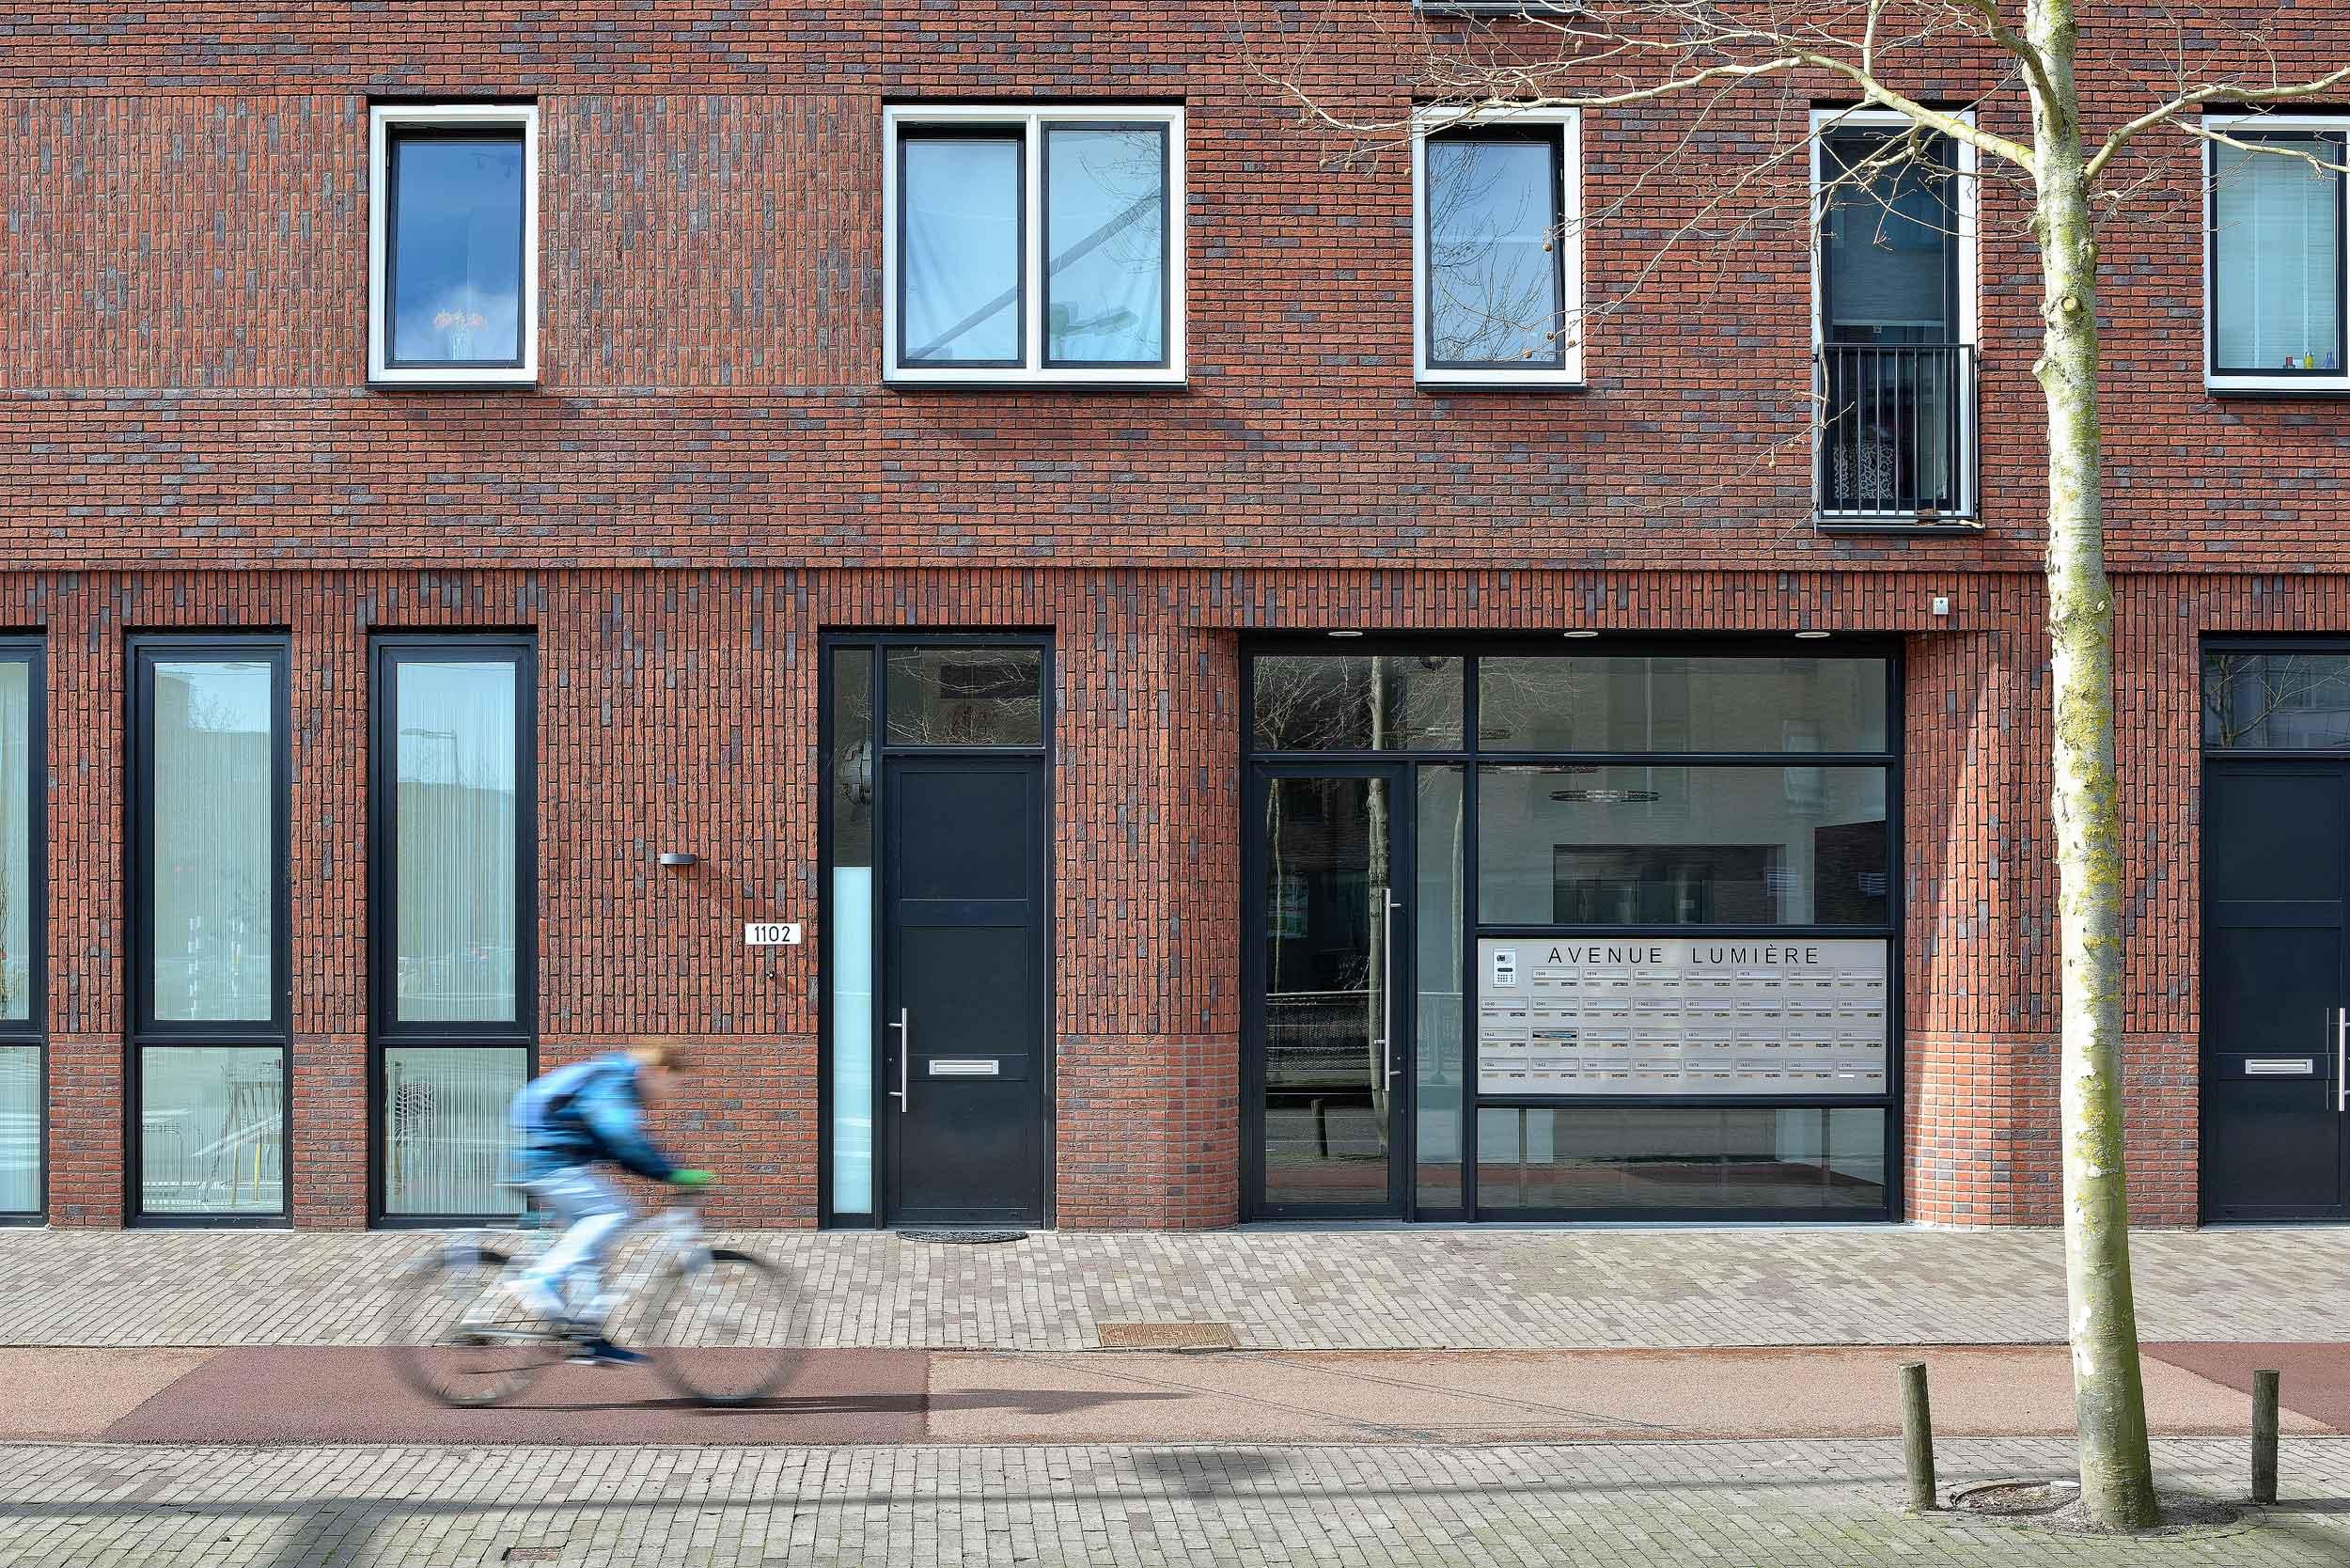 Avenue Lumiere, Amsterdam - Architectuurfotograaf Chiel de Nooyer